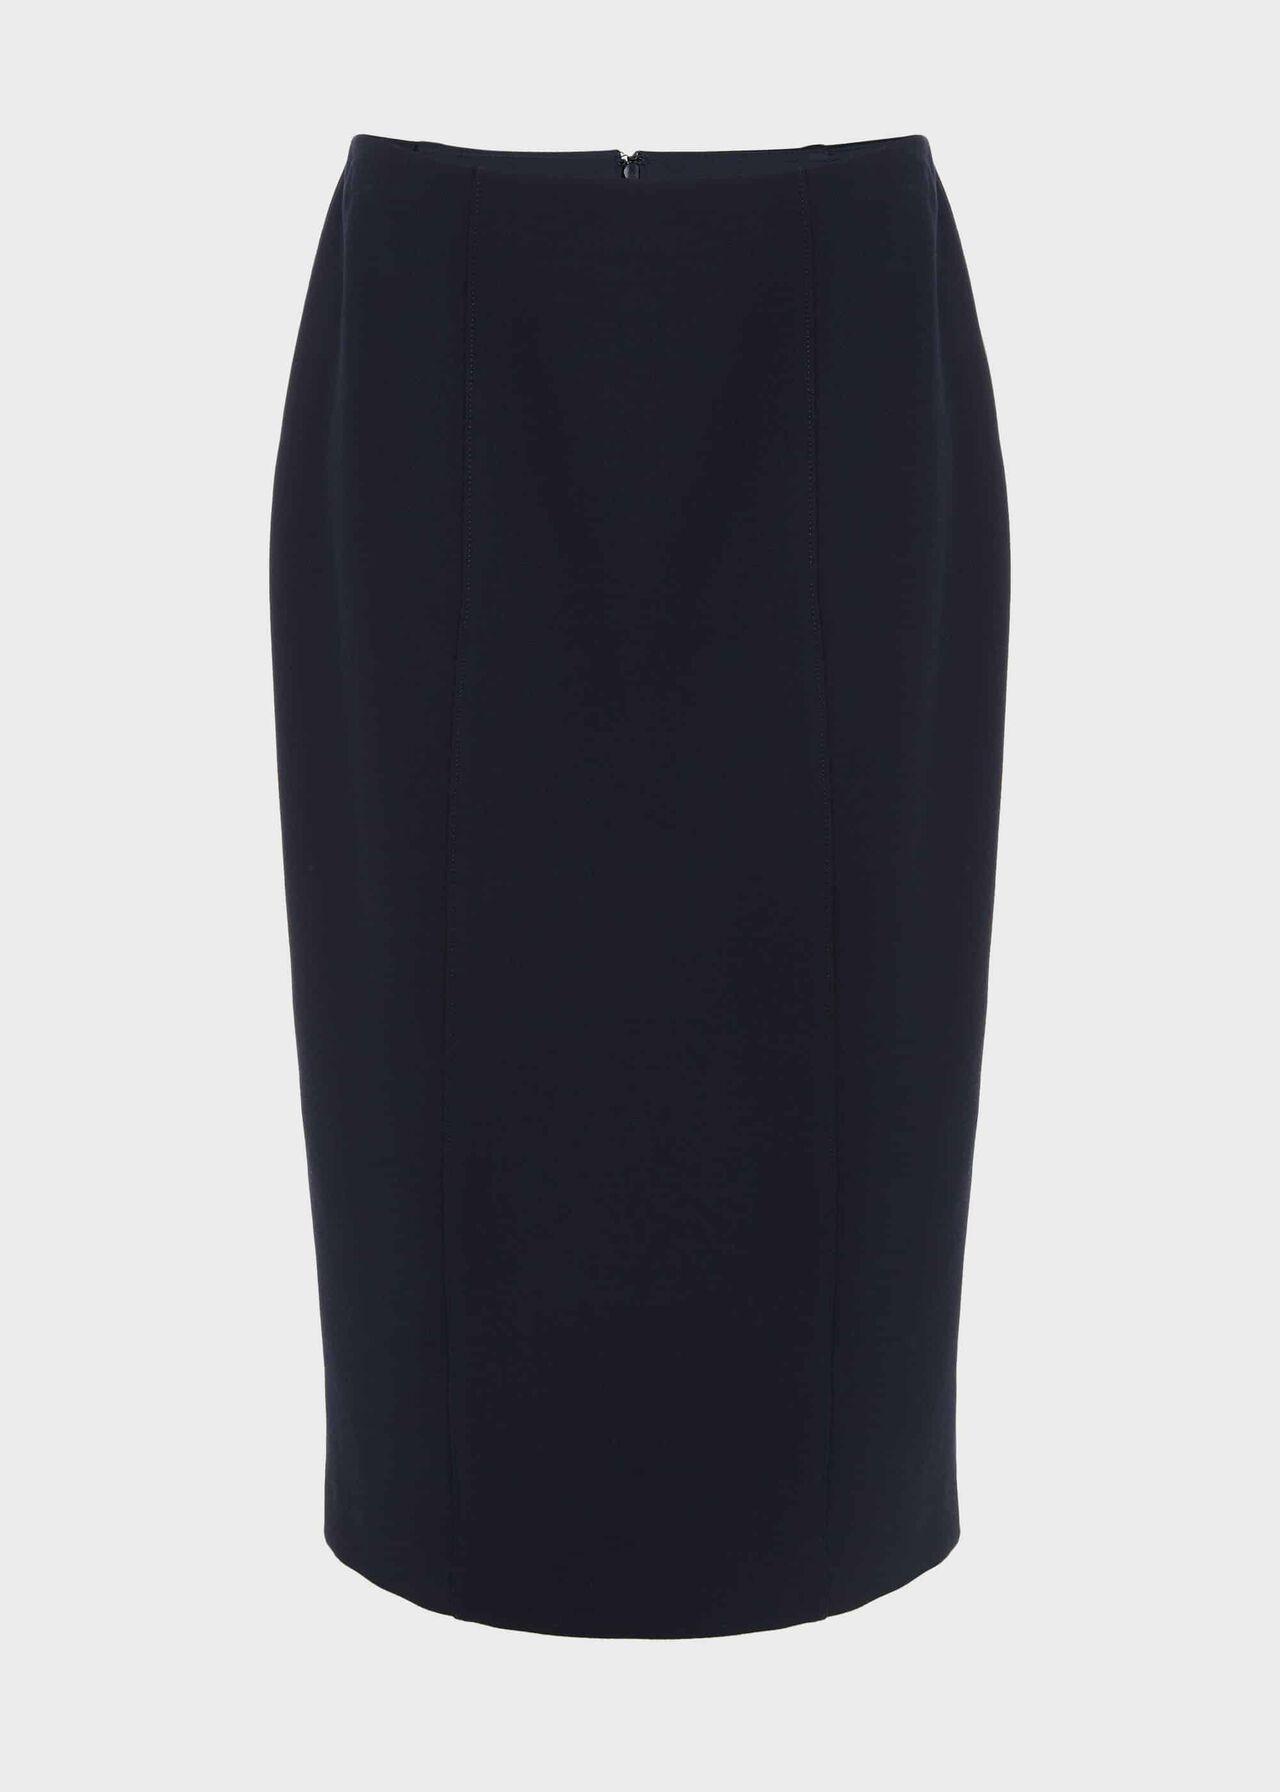 Beatrice Pencil Skirt Navy